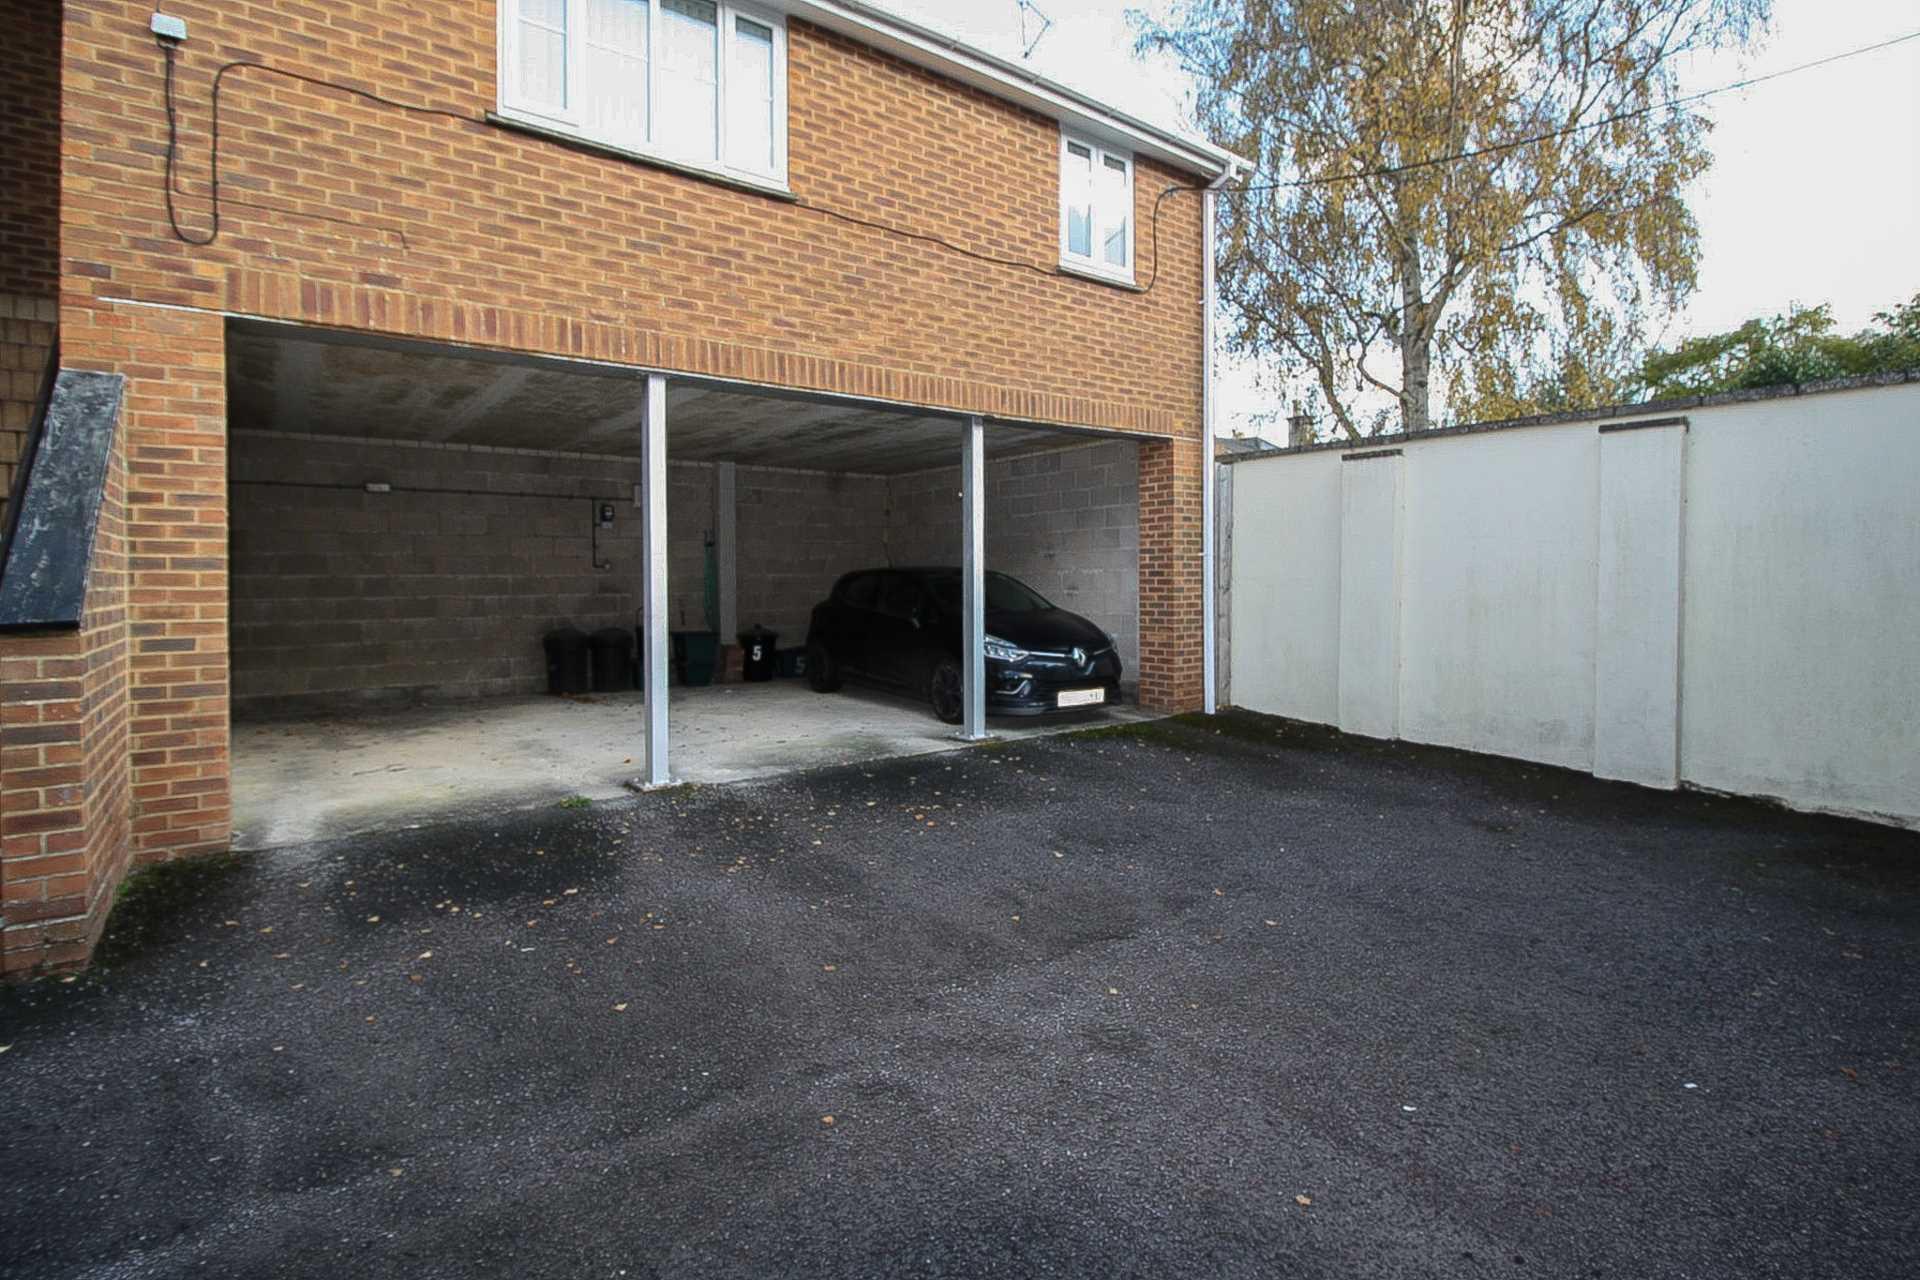 2 bed flat for sale in Dorset Mews, Dorset Street, Blandford Forum 5